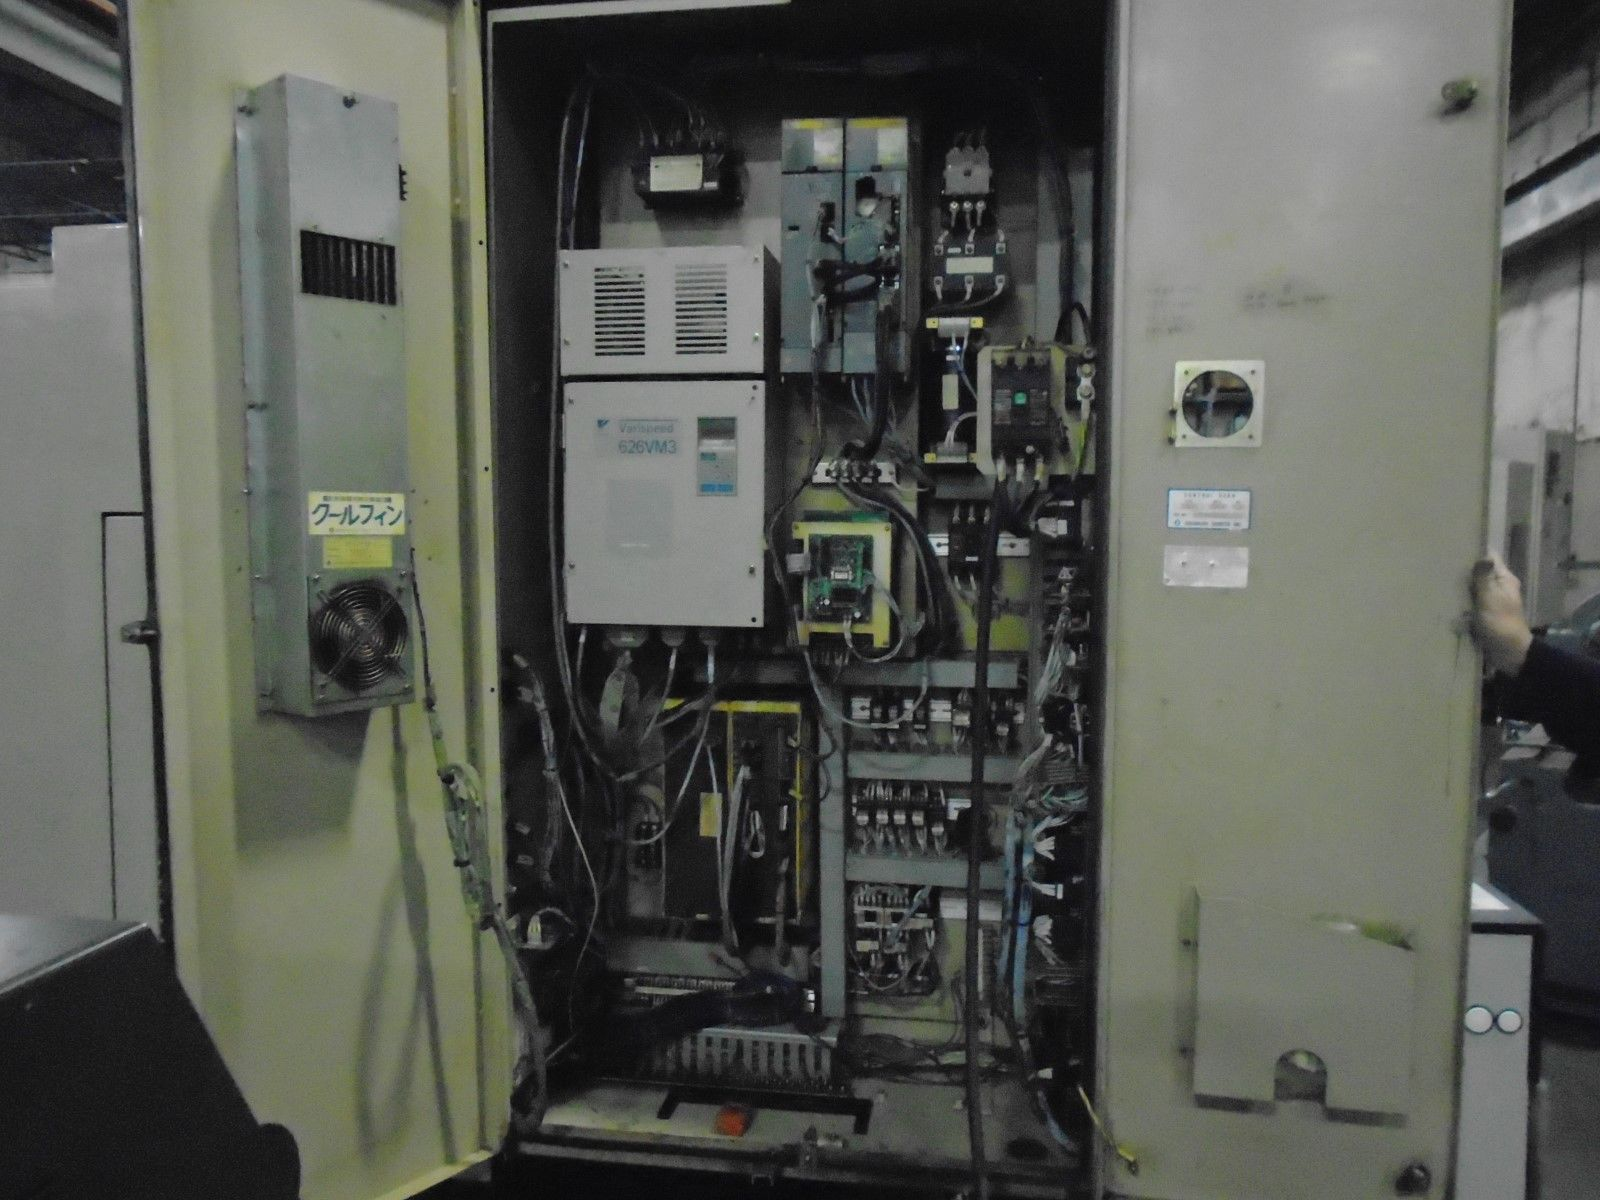 Hitachi Seiki CS20 Vertical CNC Lathe 10L Seicos Control 1998 - Image 10 of 12